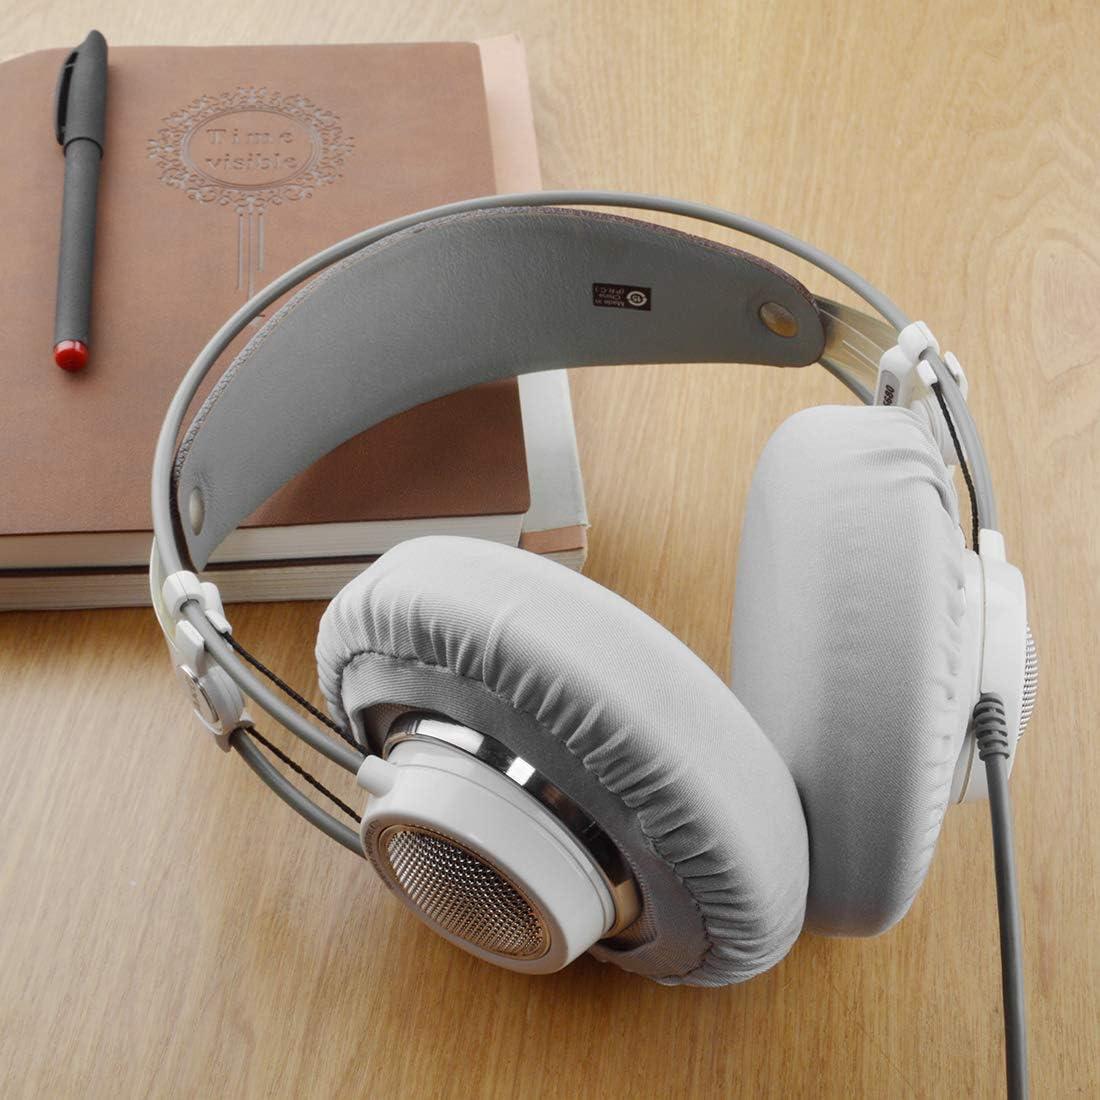 K612Pro K701 K872 K240 K121 Headphone Earcup Covers//Stretchable and Washable Sanitary Earpad Protectors K99 Grey 2 Pairs Linkidea Earpad Covers for AKG K712 K550 K601 K702 K553